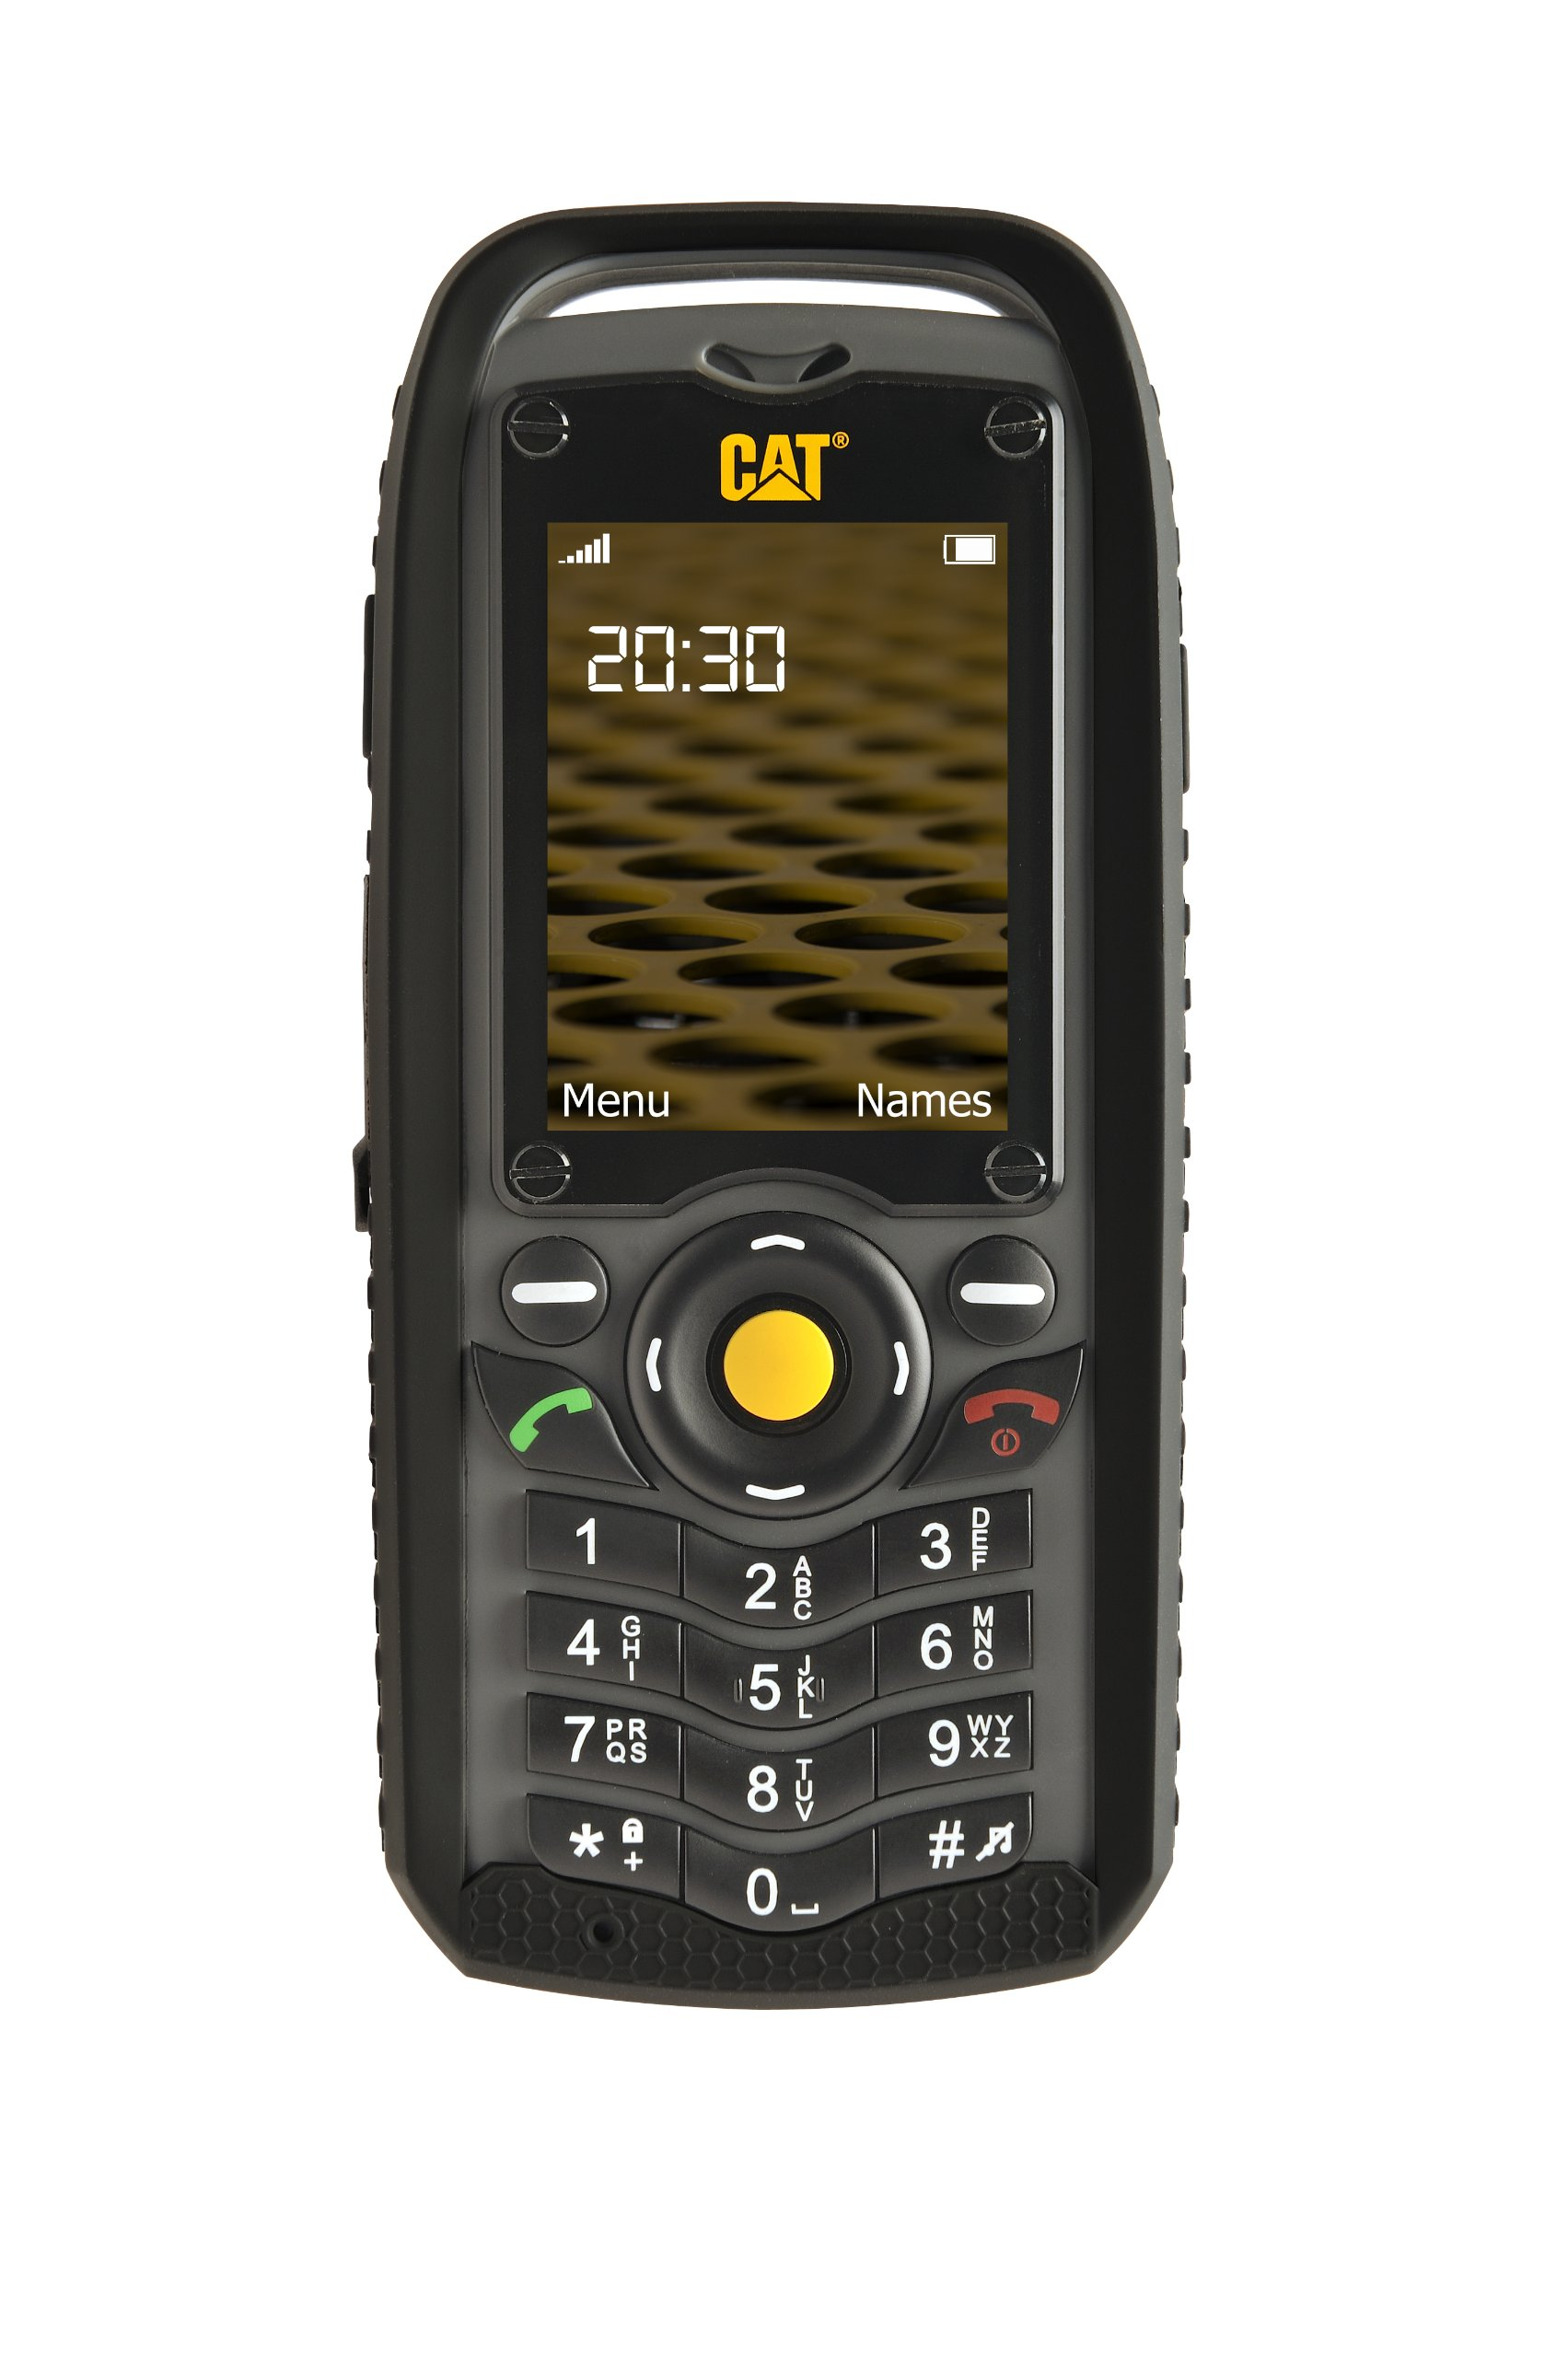 cat b25 ruggedised tough single sim sim free phone amazon co uk rh amazon co uk